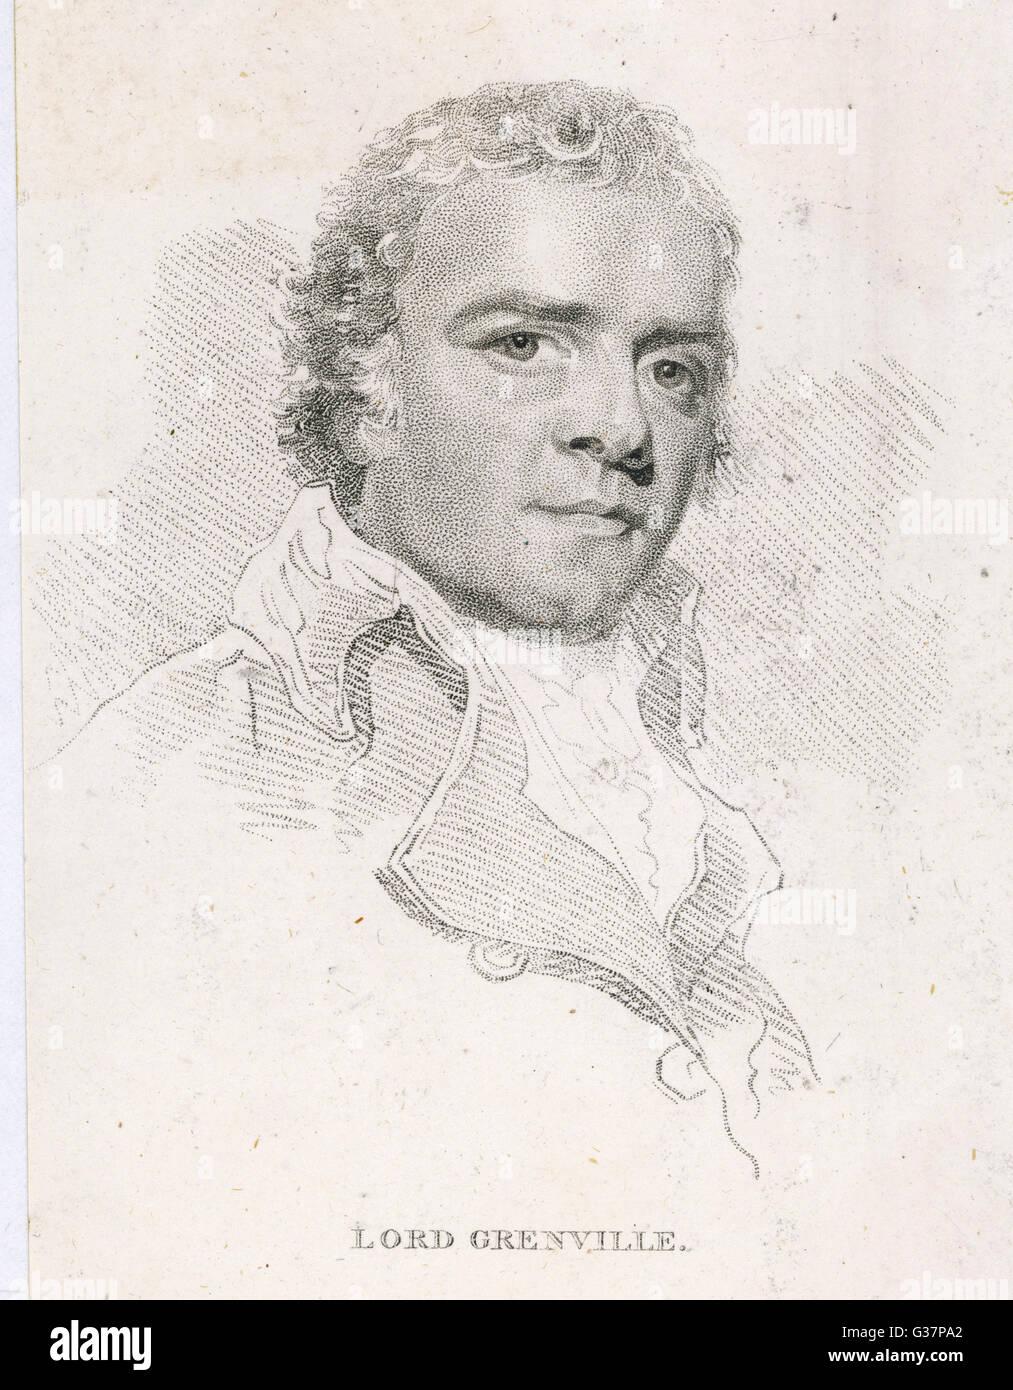 William Grenville, 1st Baron Grenville